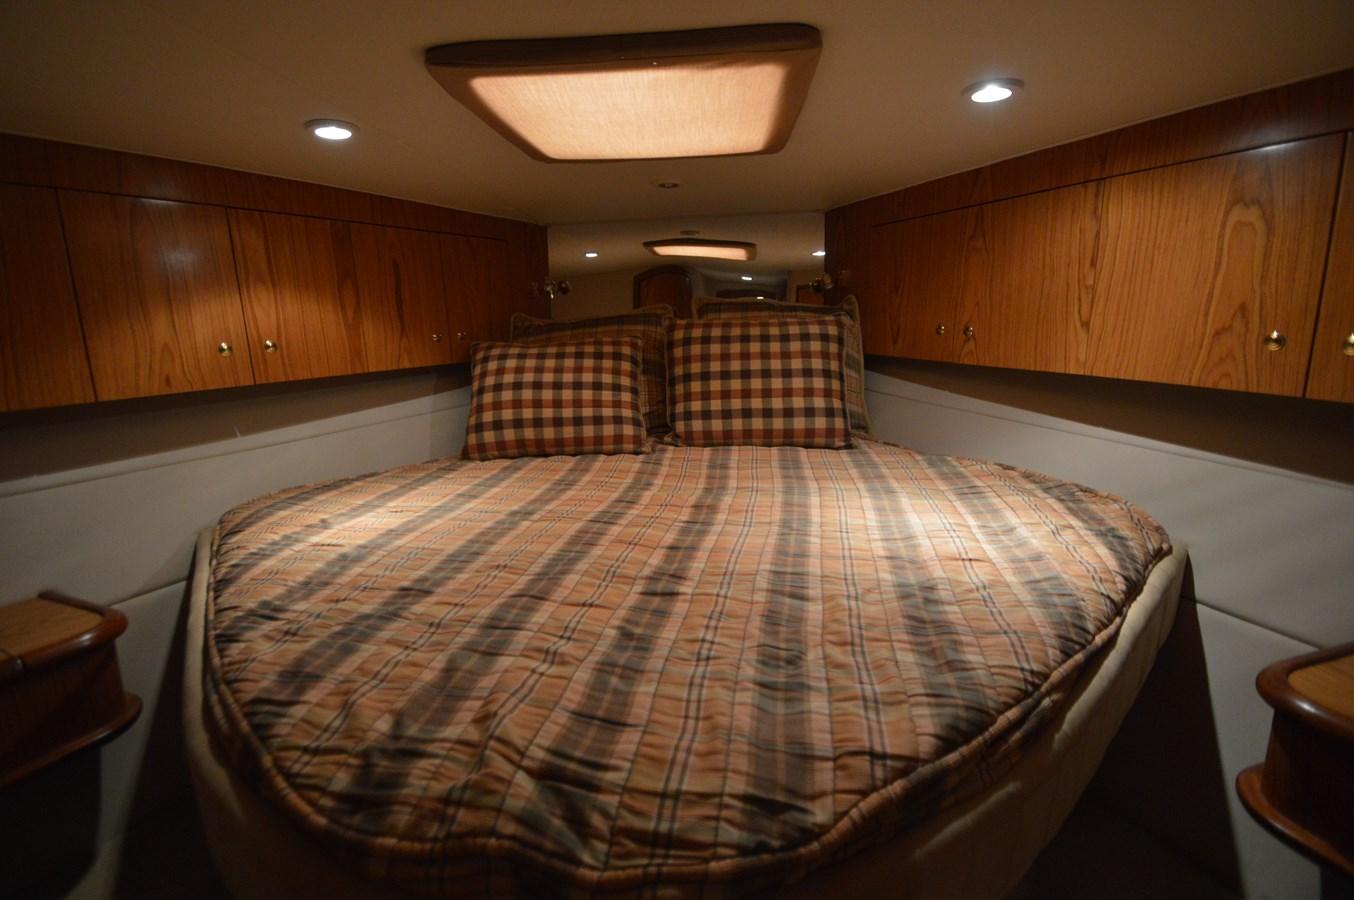 Fwd Stateroom - 58 BUDDY DAVIS For Sale